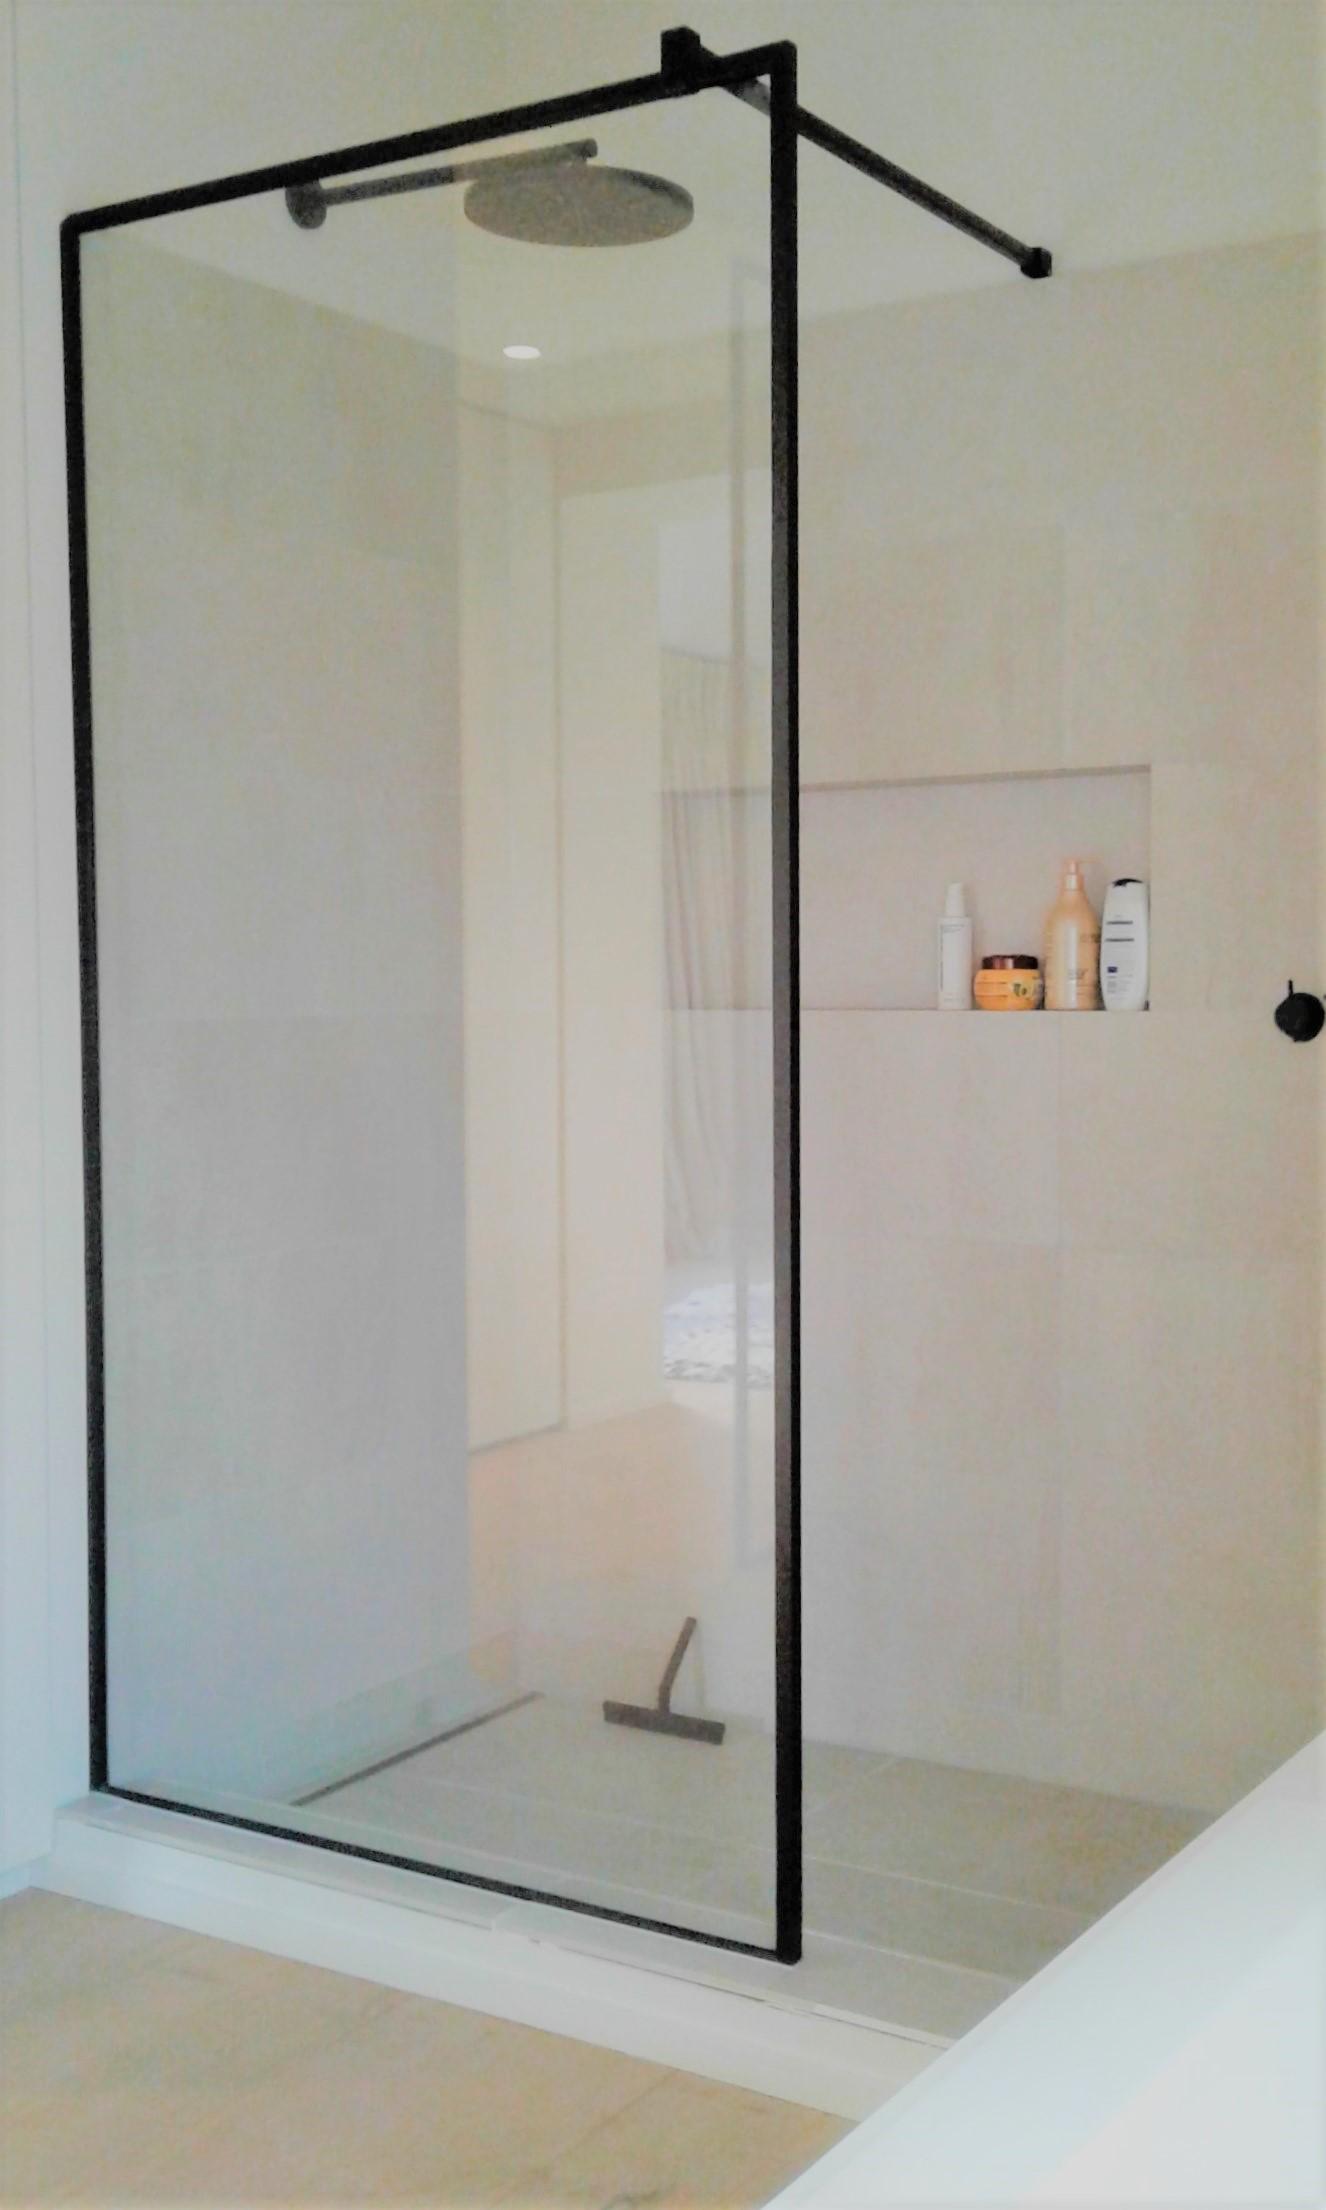 Glazen douchewanden, douchedeuren & doucheschermen : Glaswerken ...